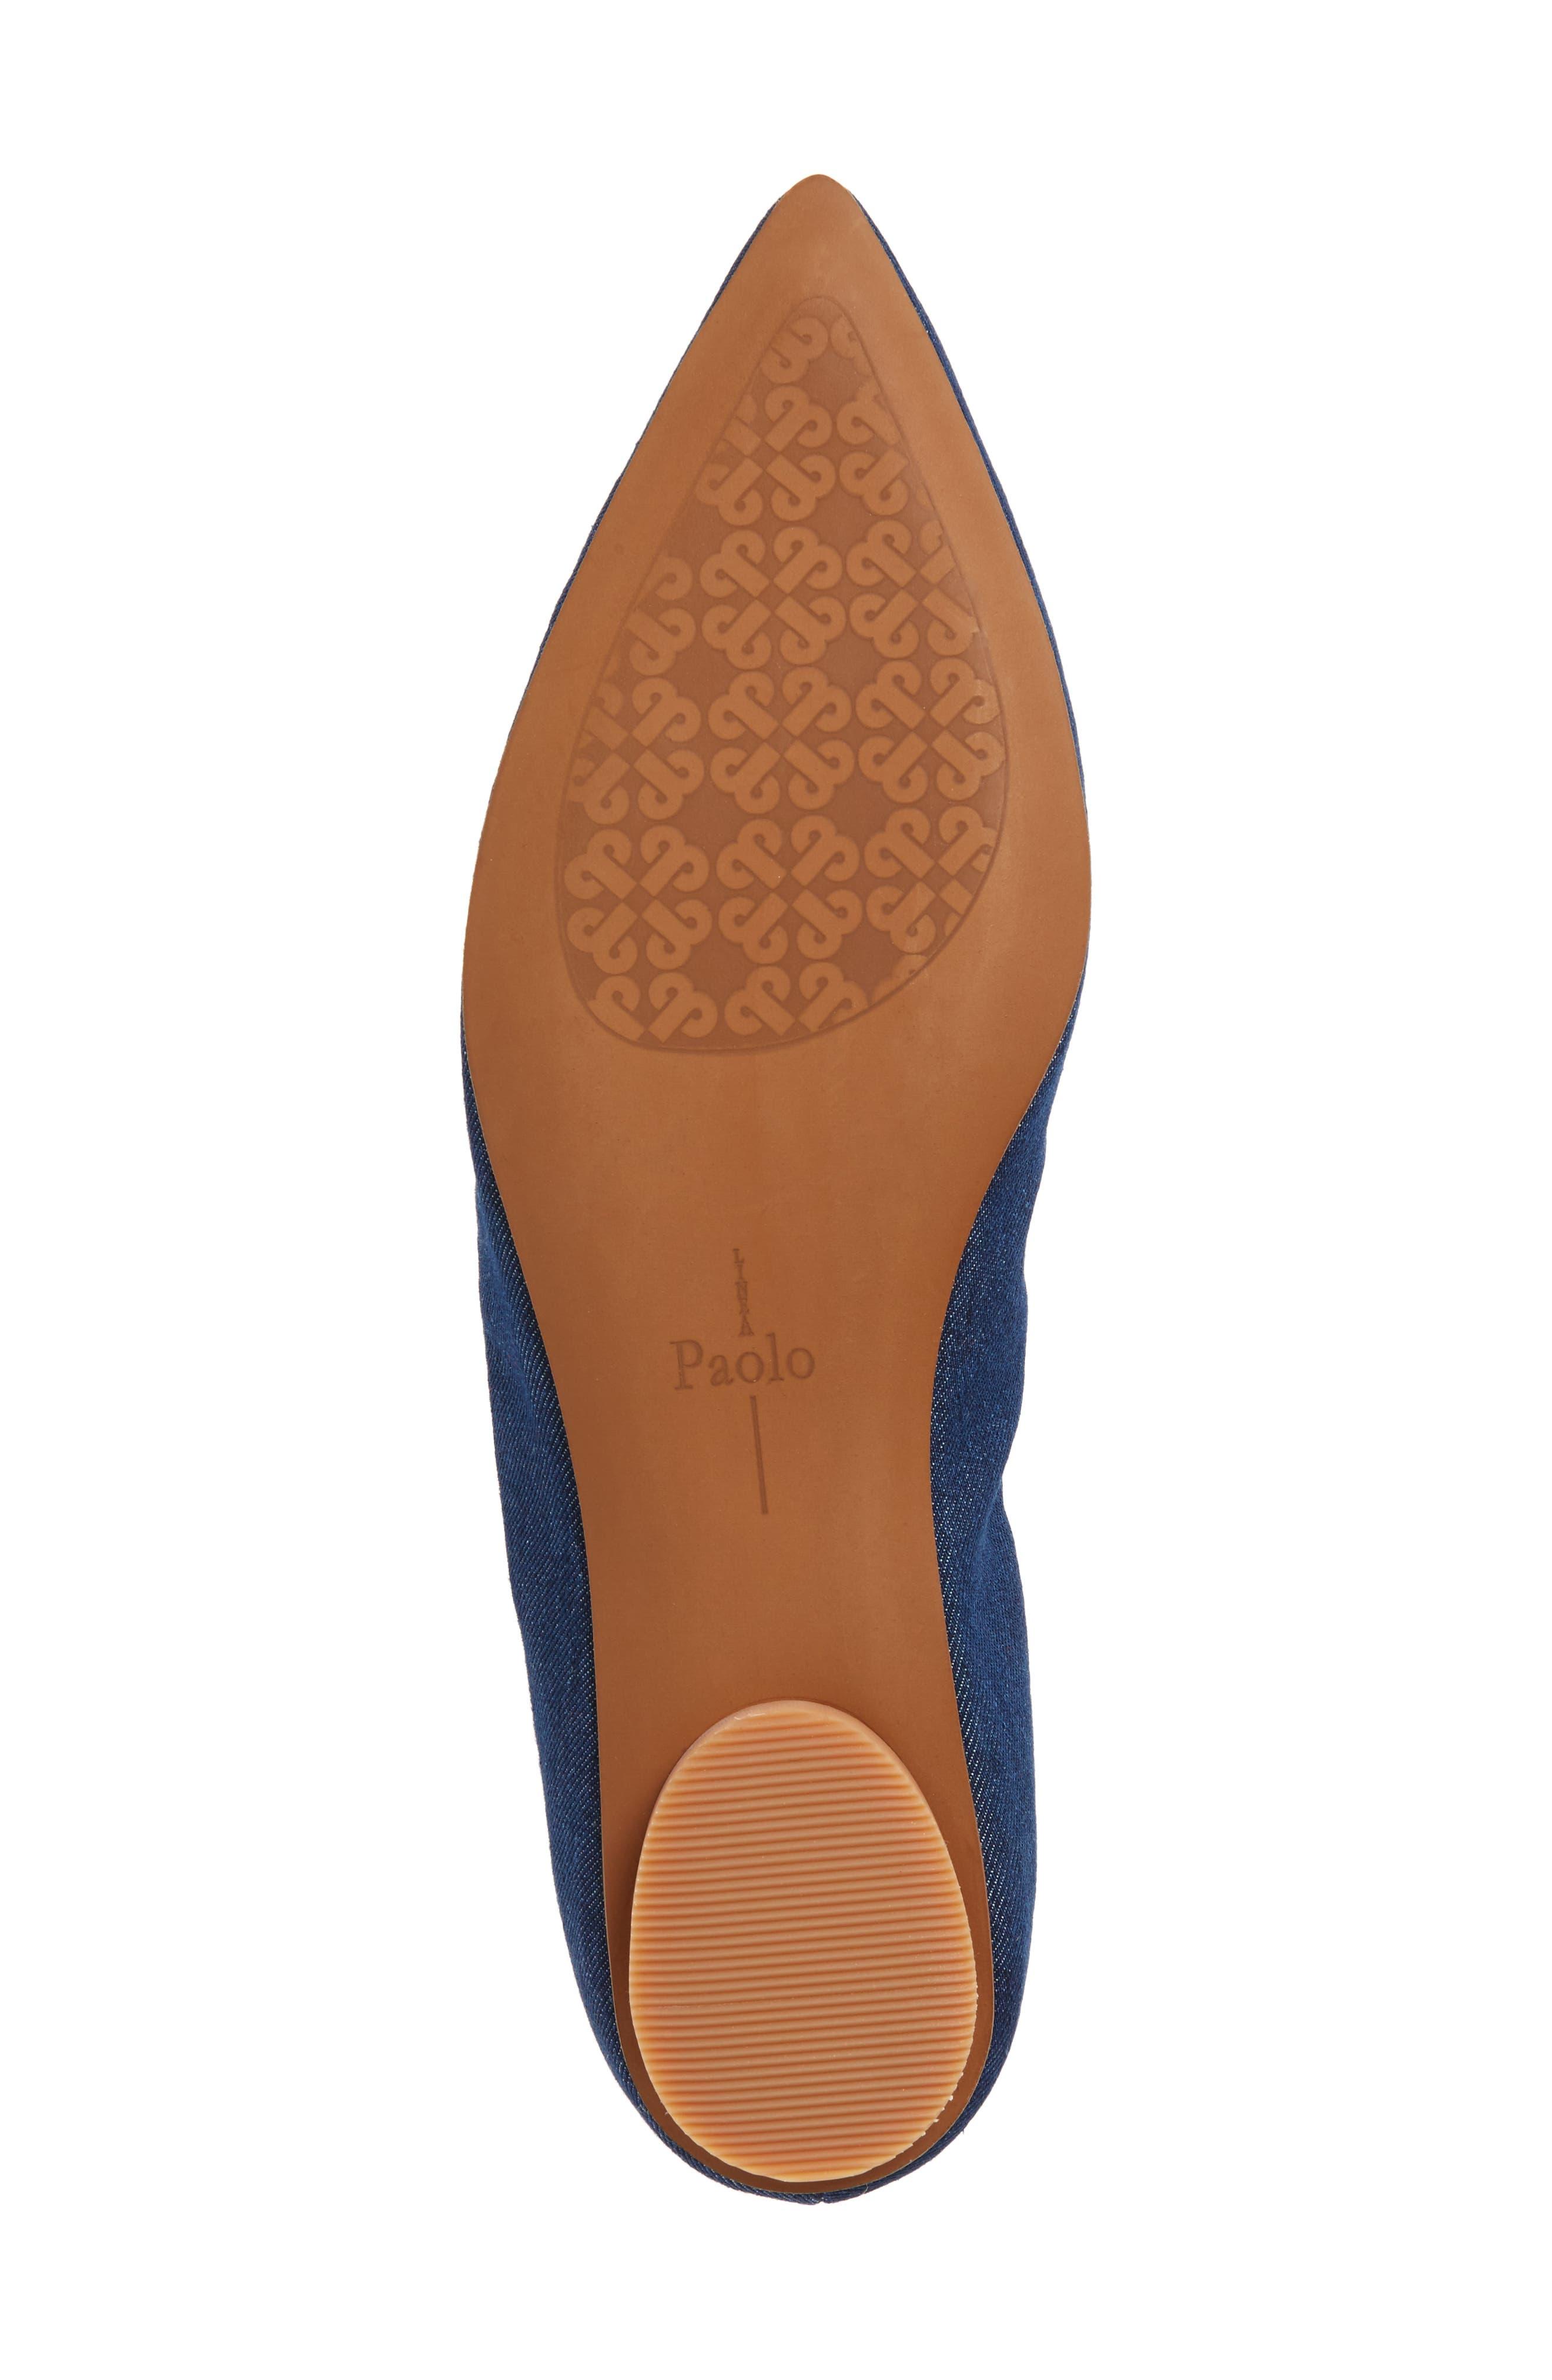 Nadia Embellished Pointy Toe Flat,                             Alternate thumbnail 6, color,                             NAVY DENIM FABRIC